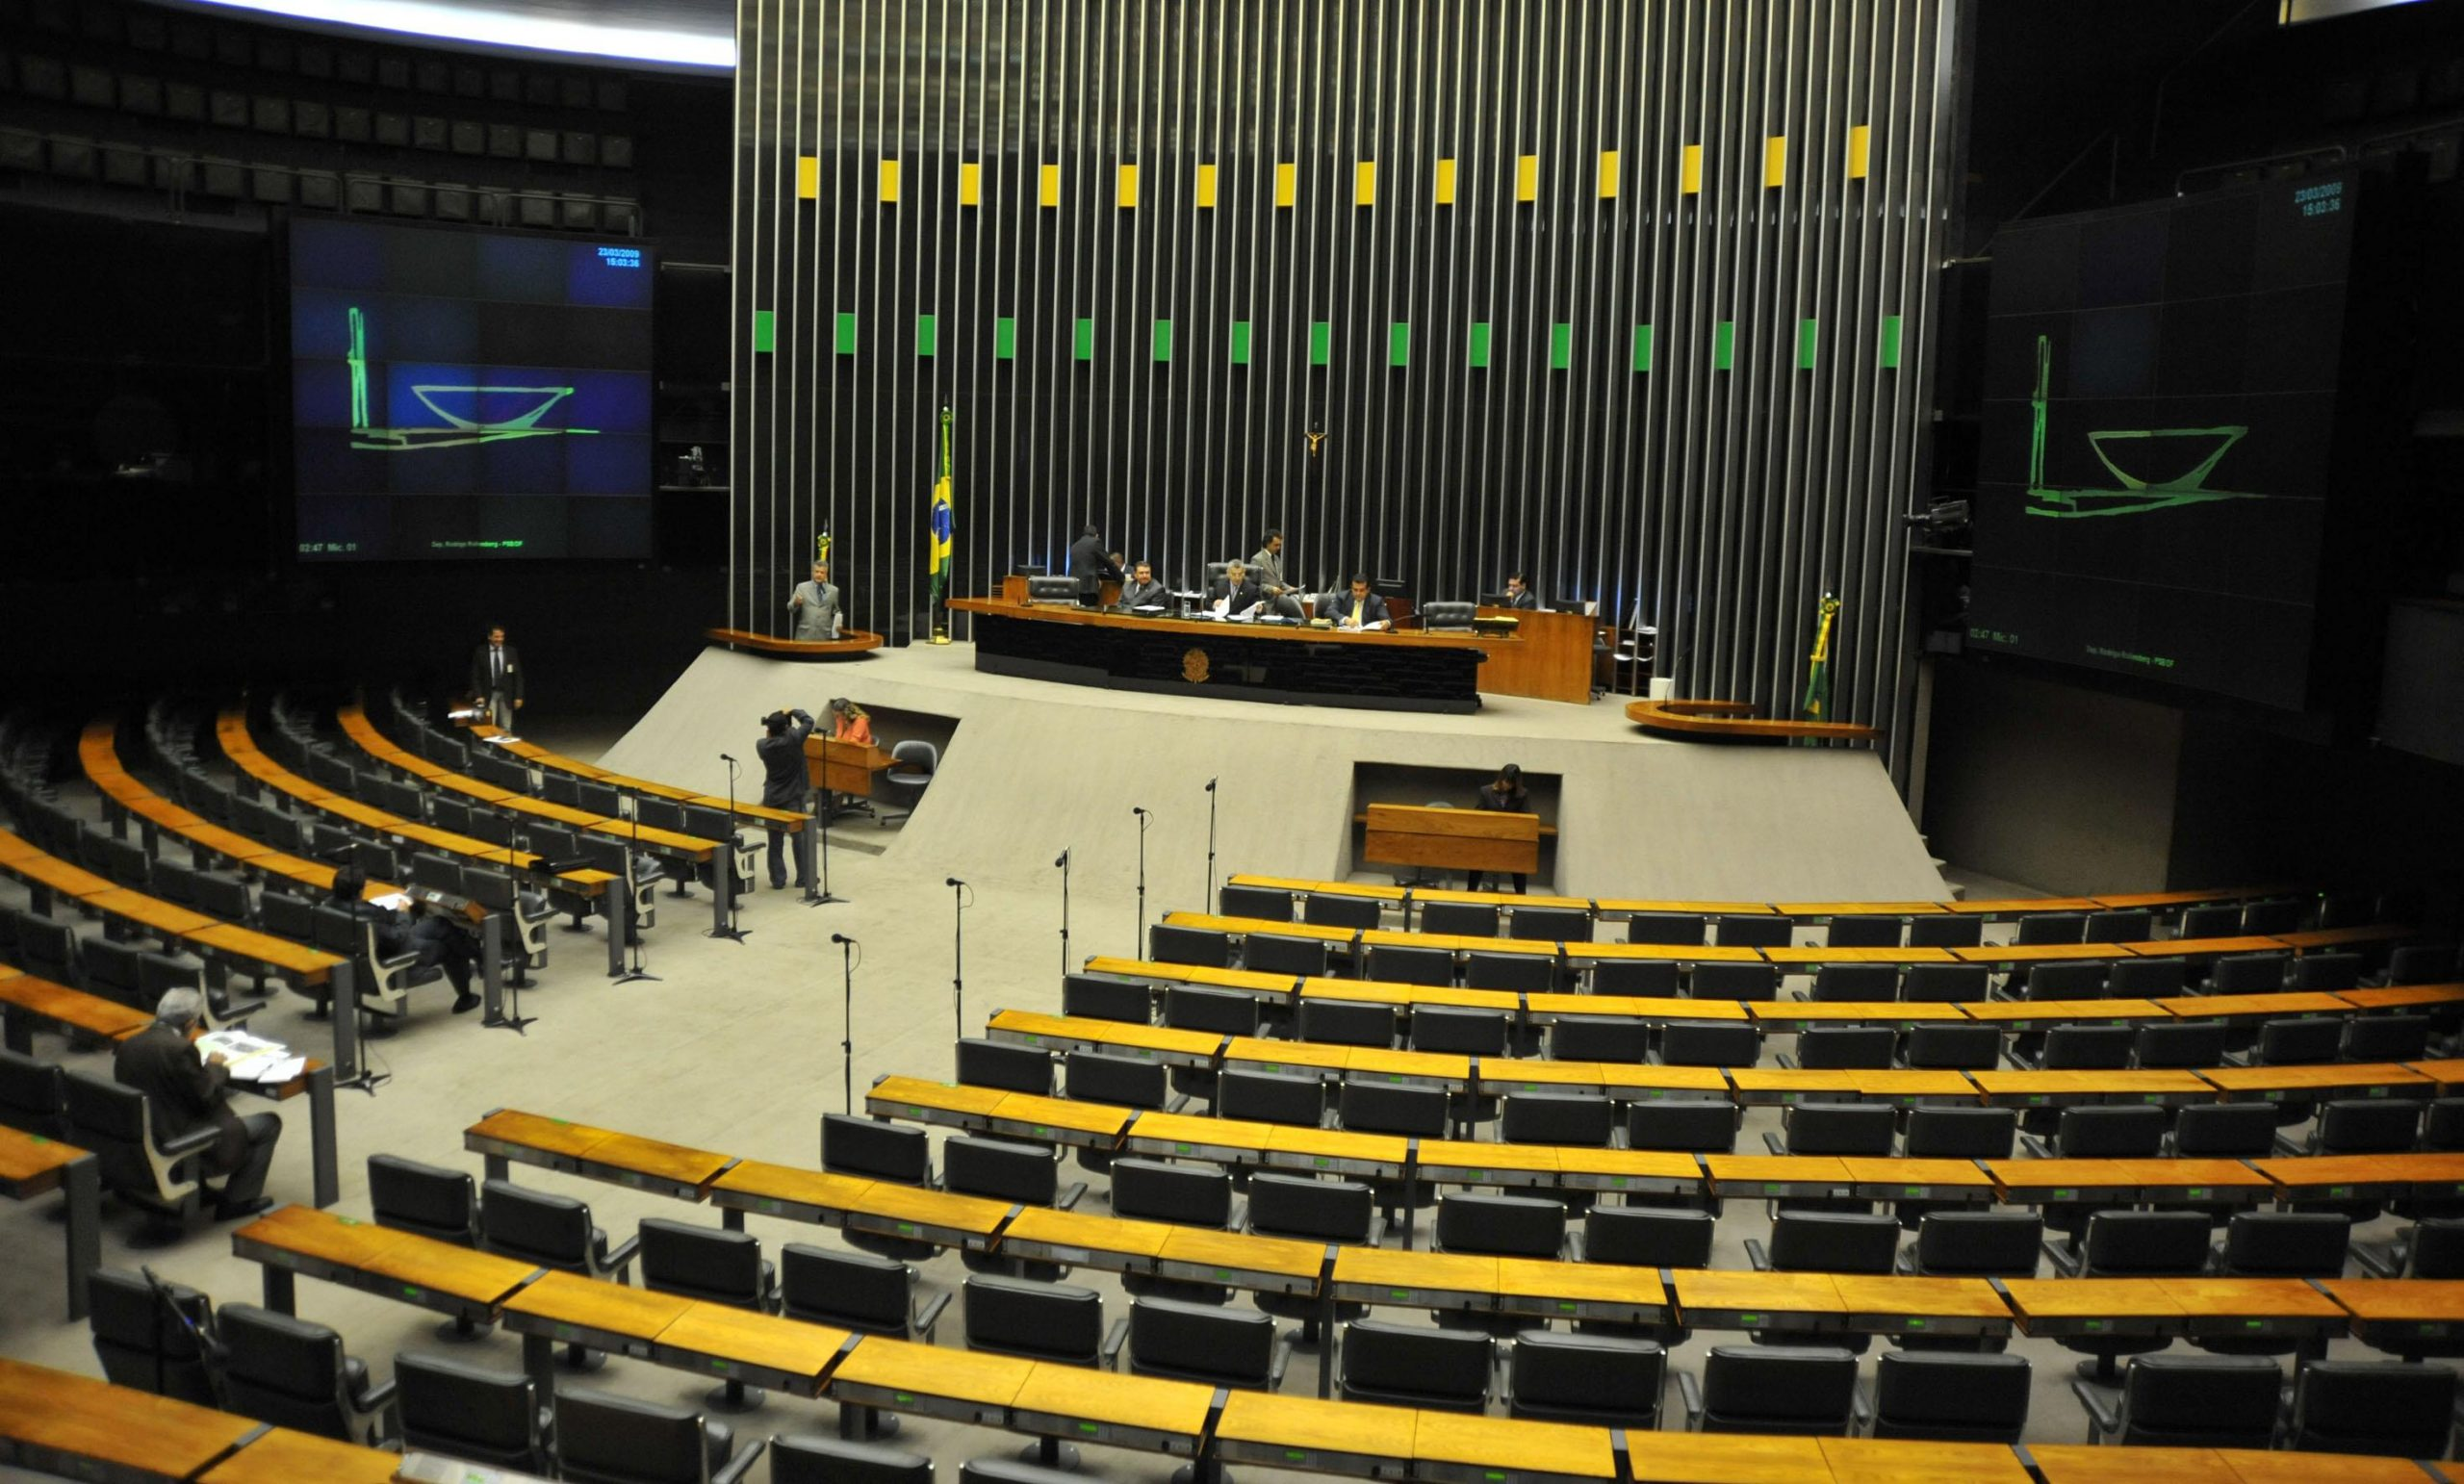 SINTSEP-AL x PL – Sindicato luta contra Partido que pretende fazer descontos nos salários dos servidores públicos